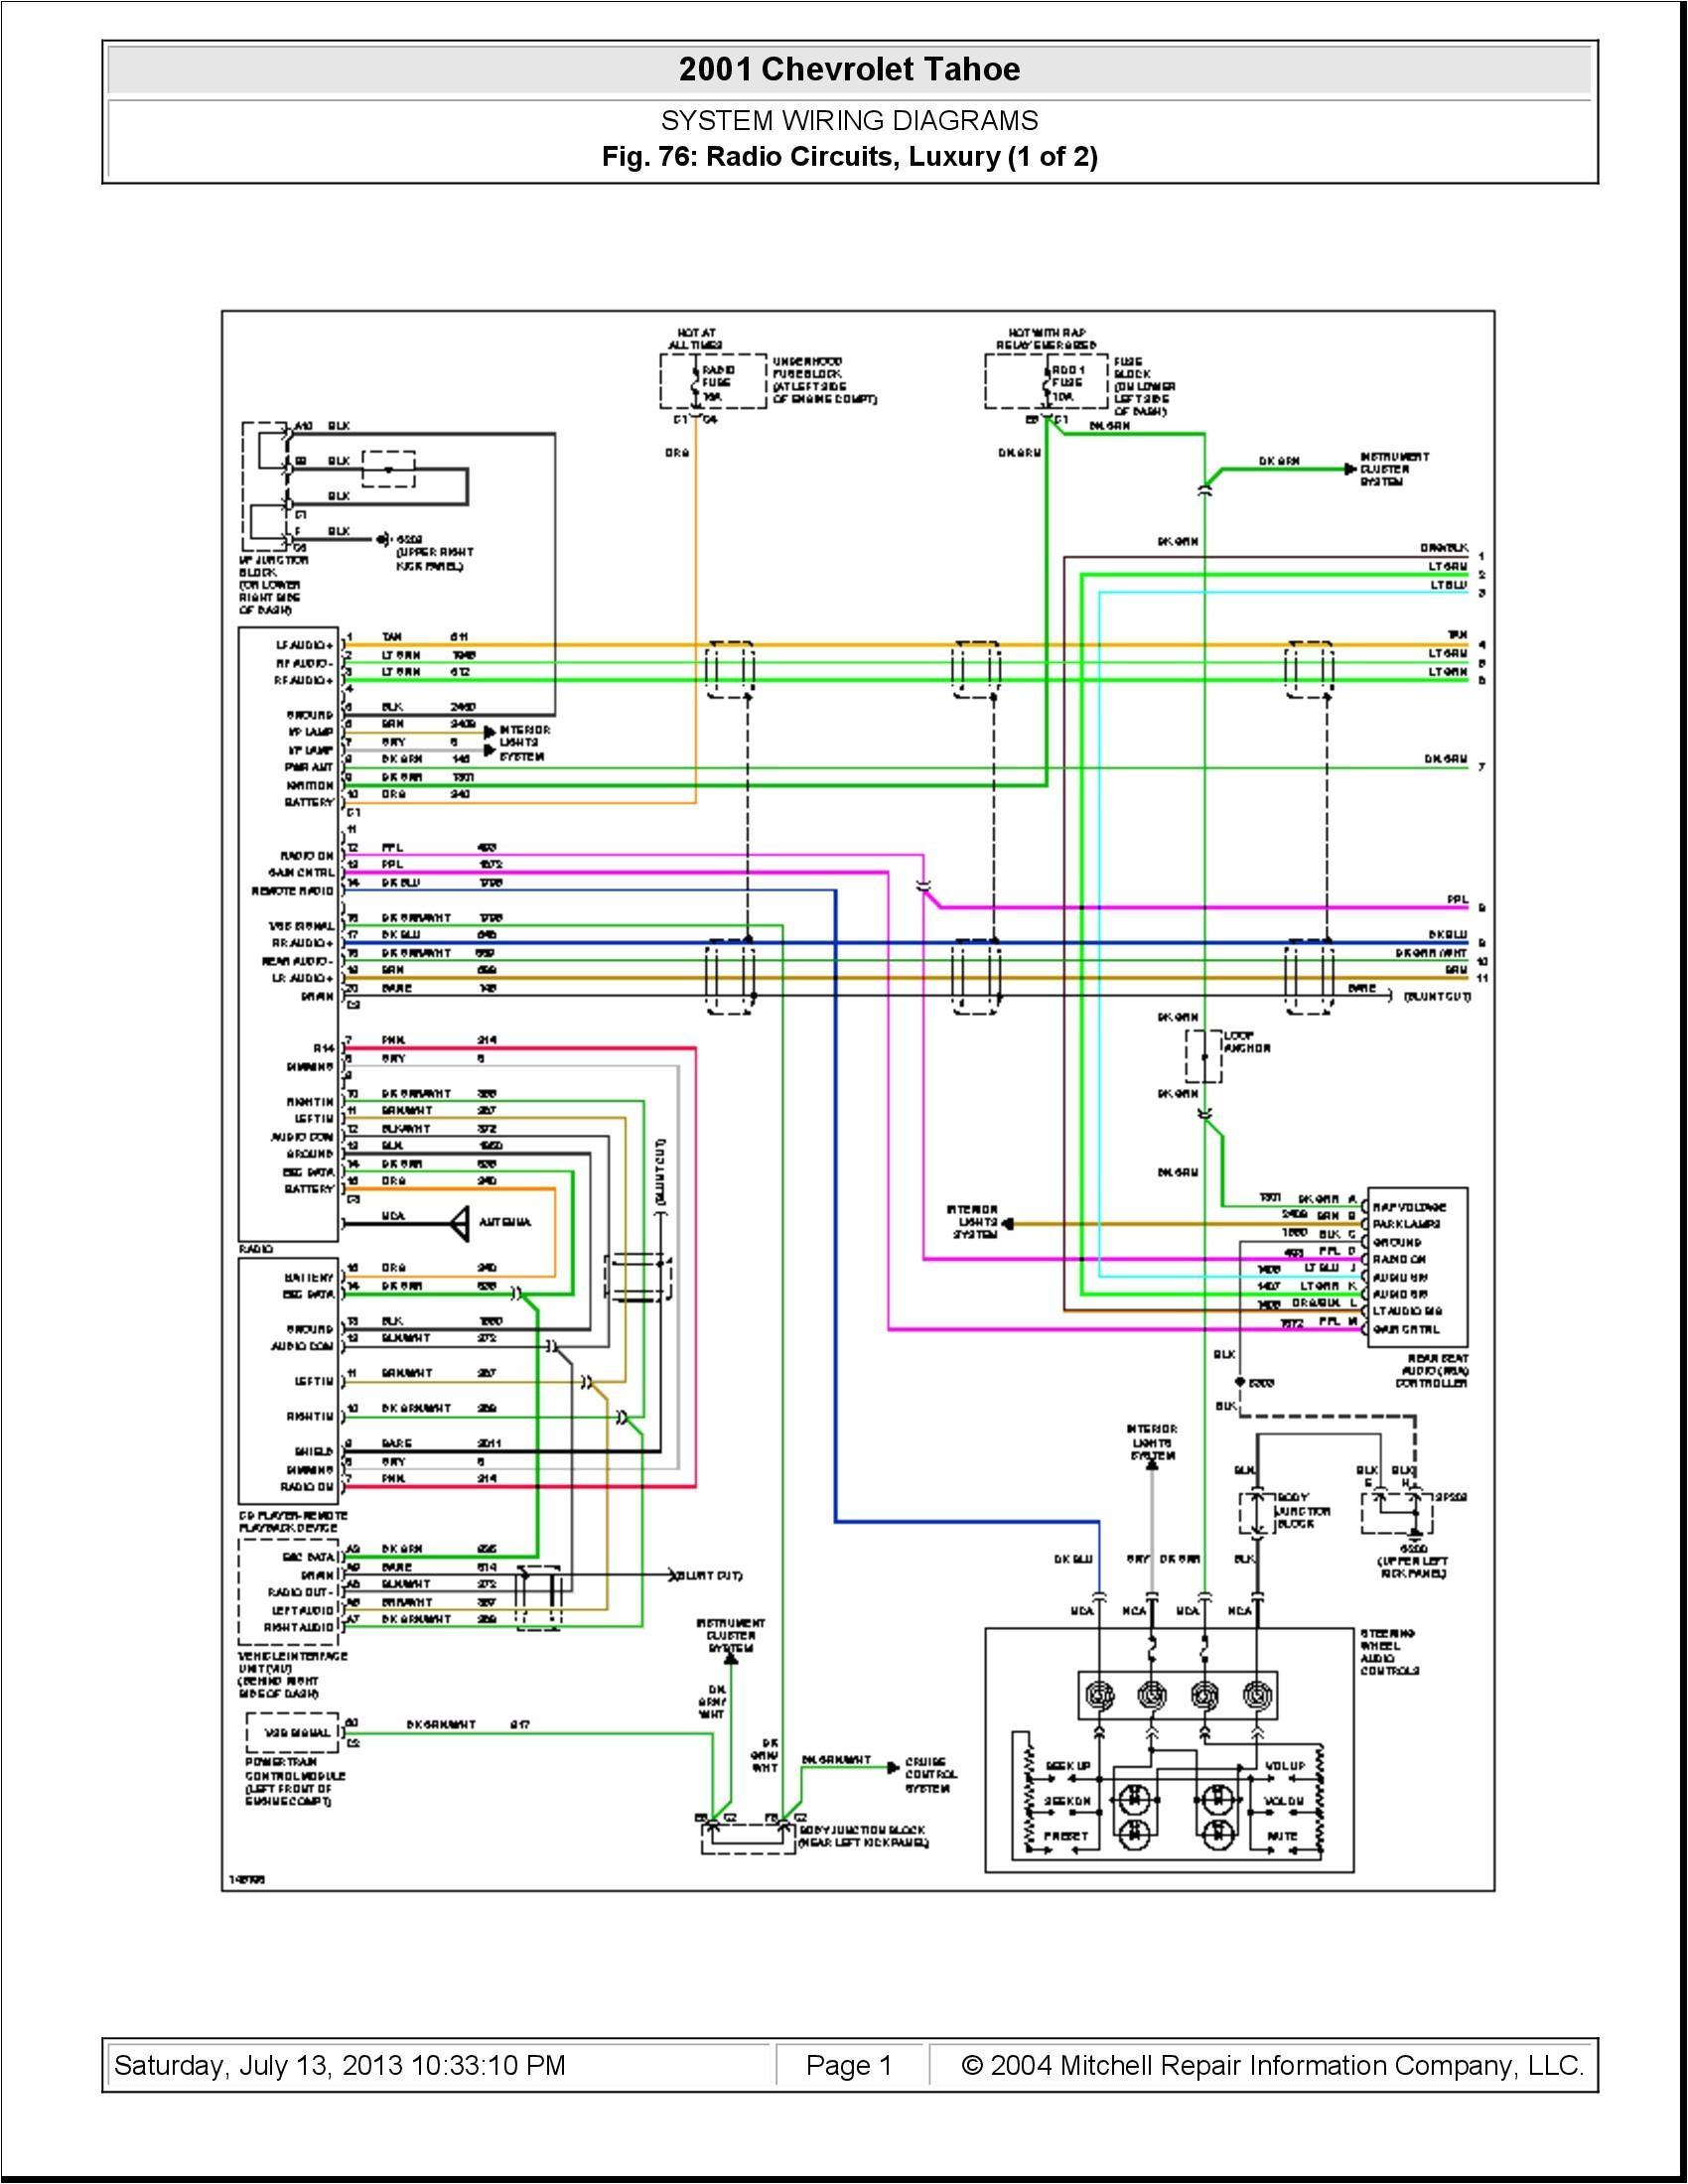 2002 Chevrolet Cavalier Wiring Diagram 2000 Cavalier Fuse Diagram Wiring Diagram Article Review